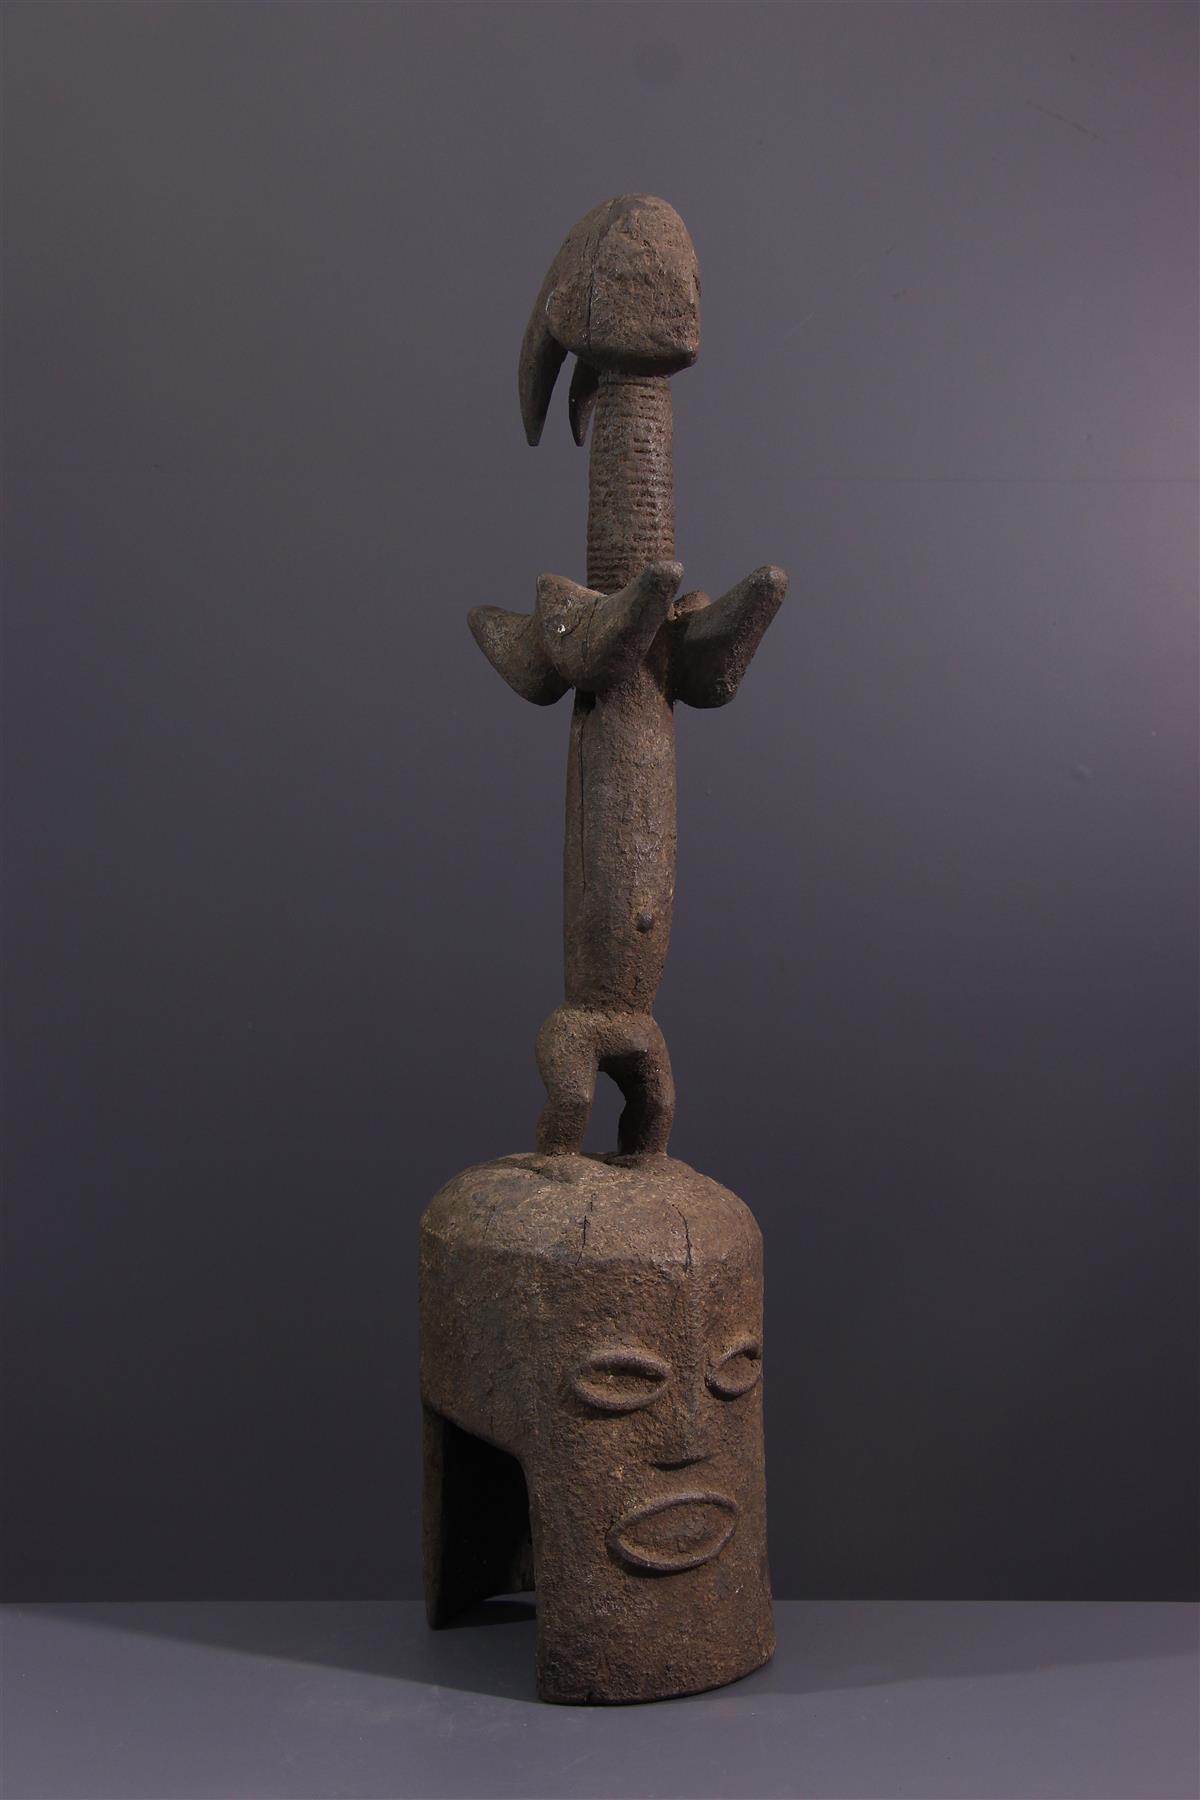 Kaka Mask - Tribal art